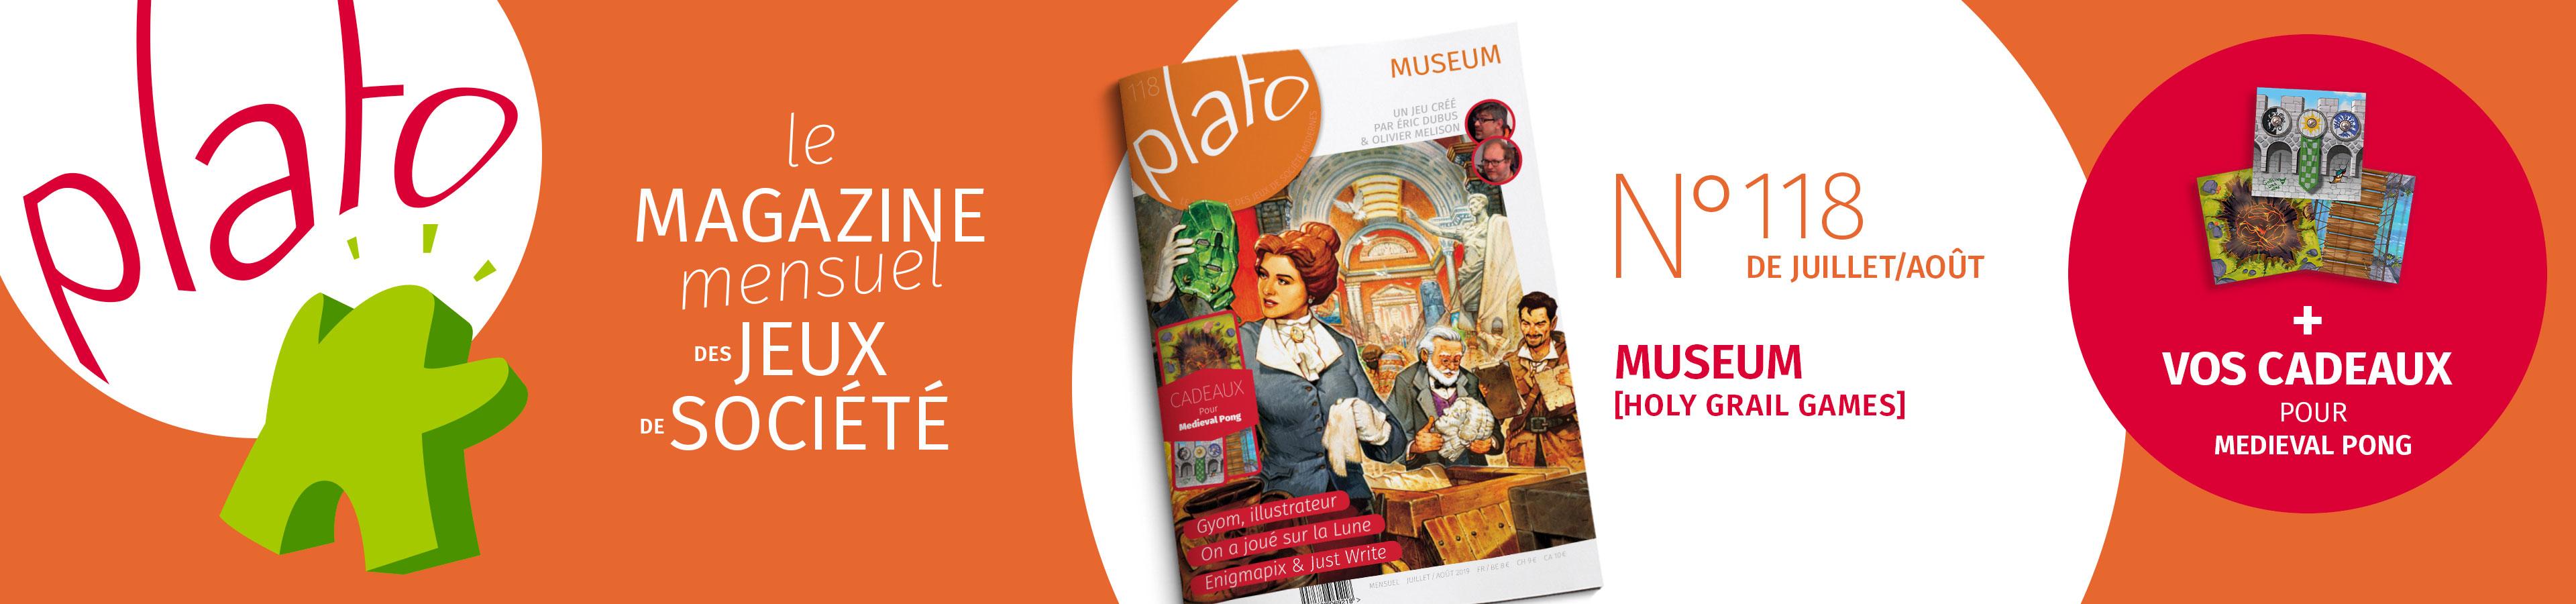 Plato Magazine